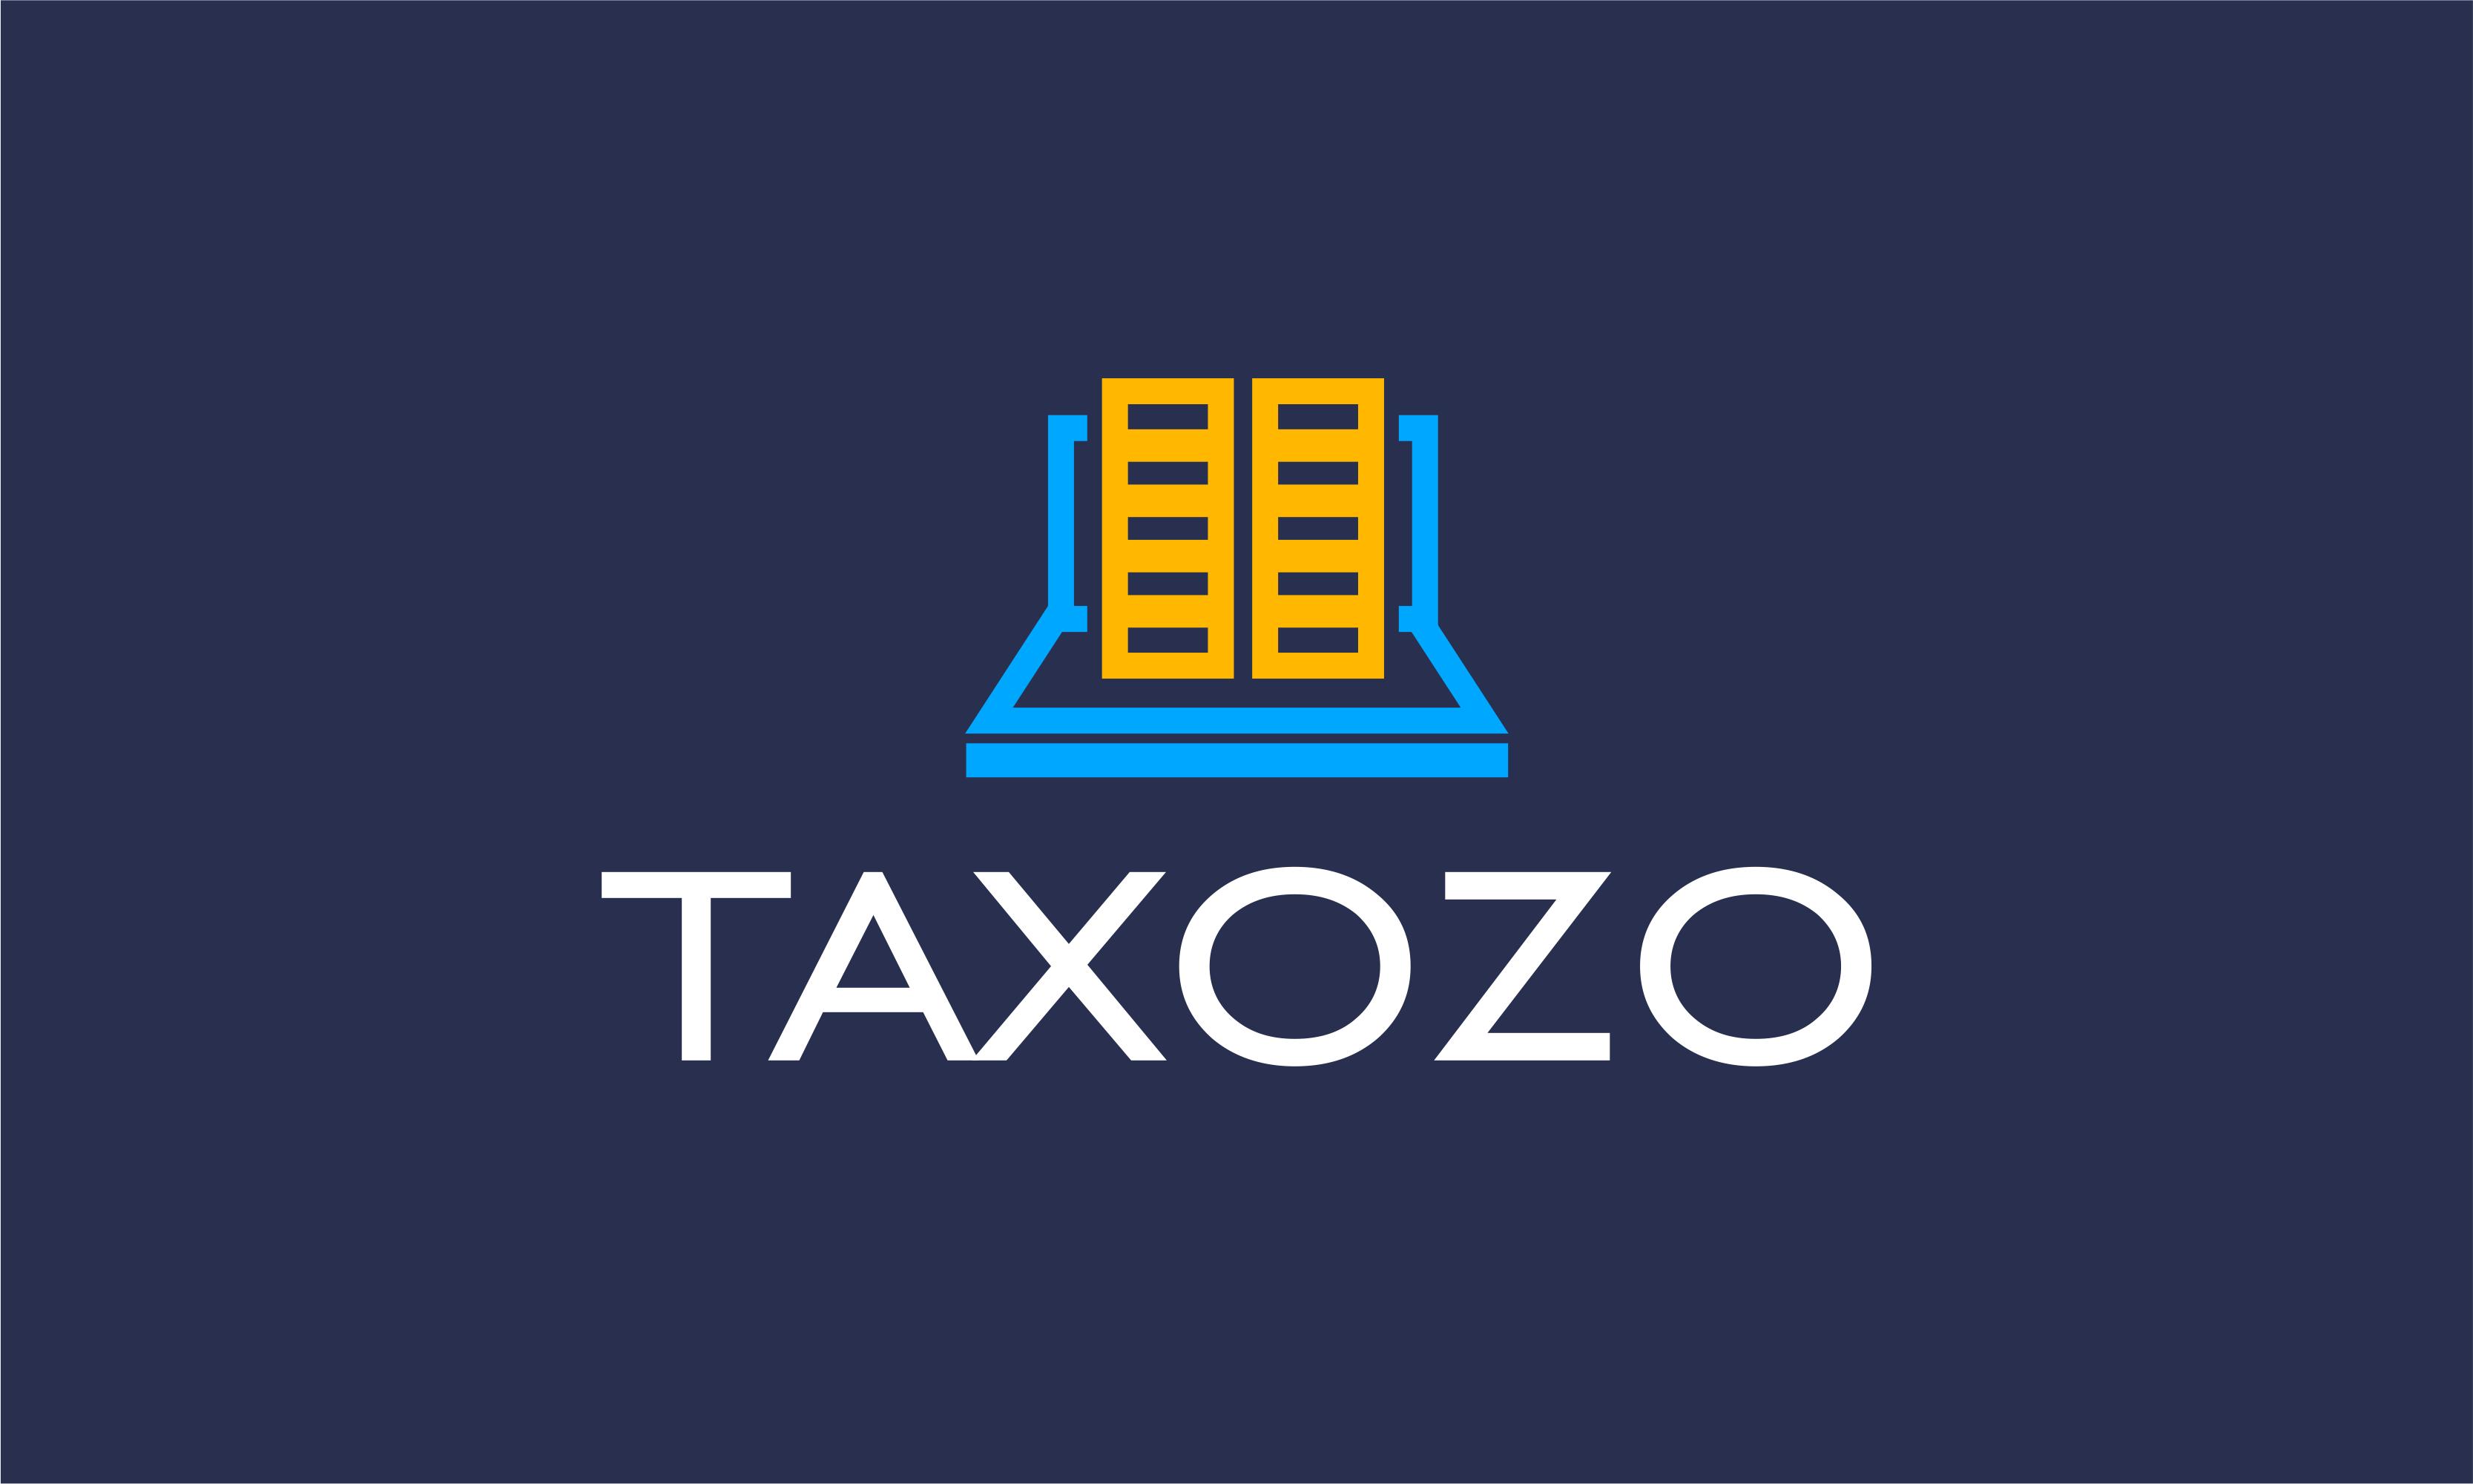 Taxozo